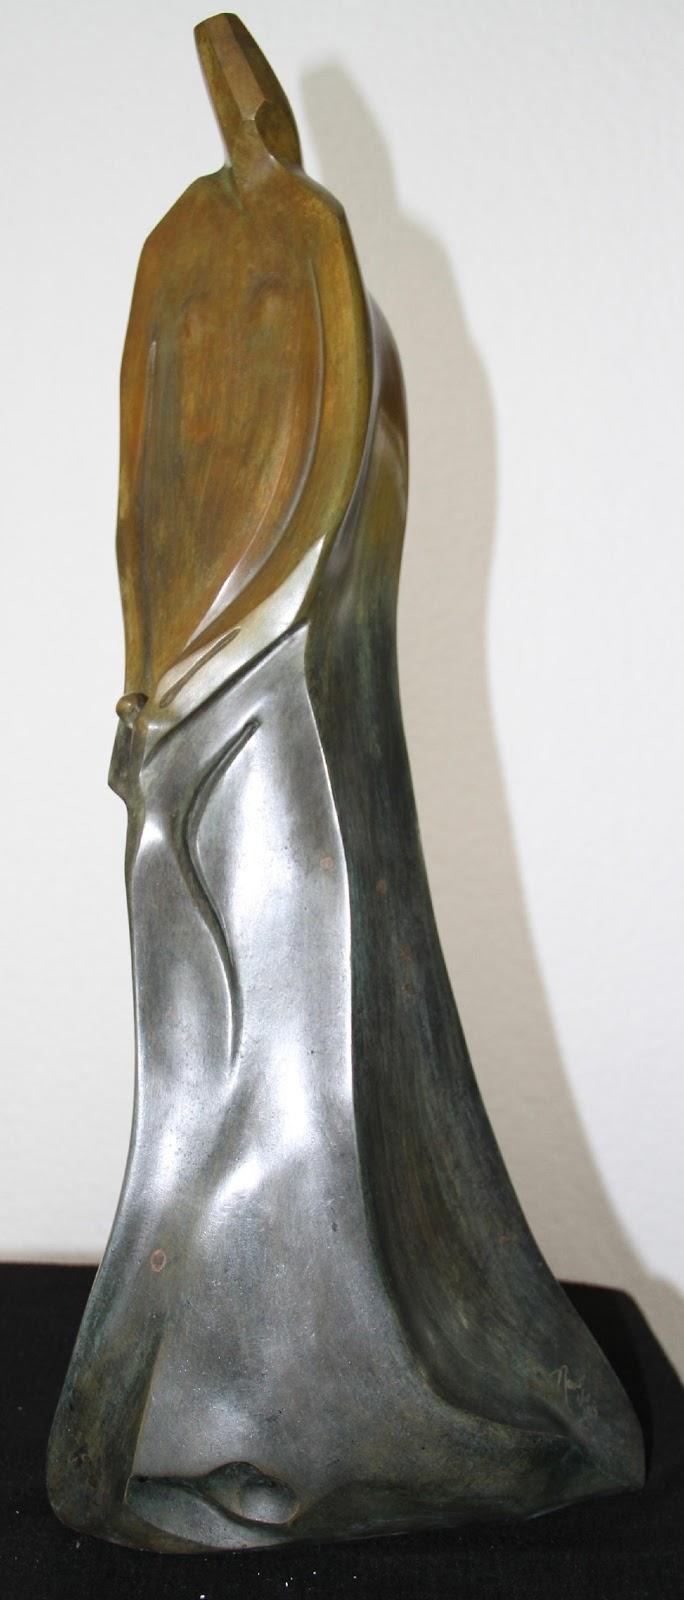 Entre tus manos - Nour Kuri, Escultura